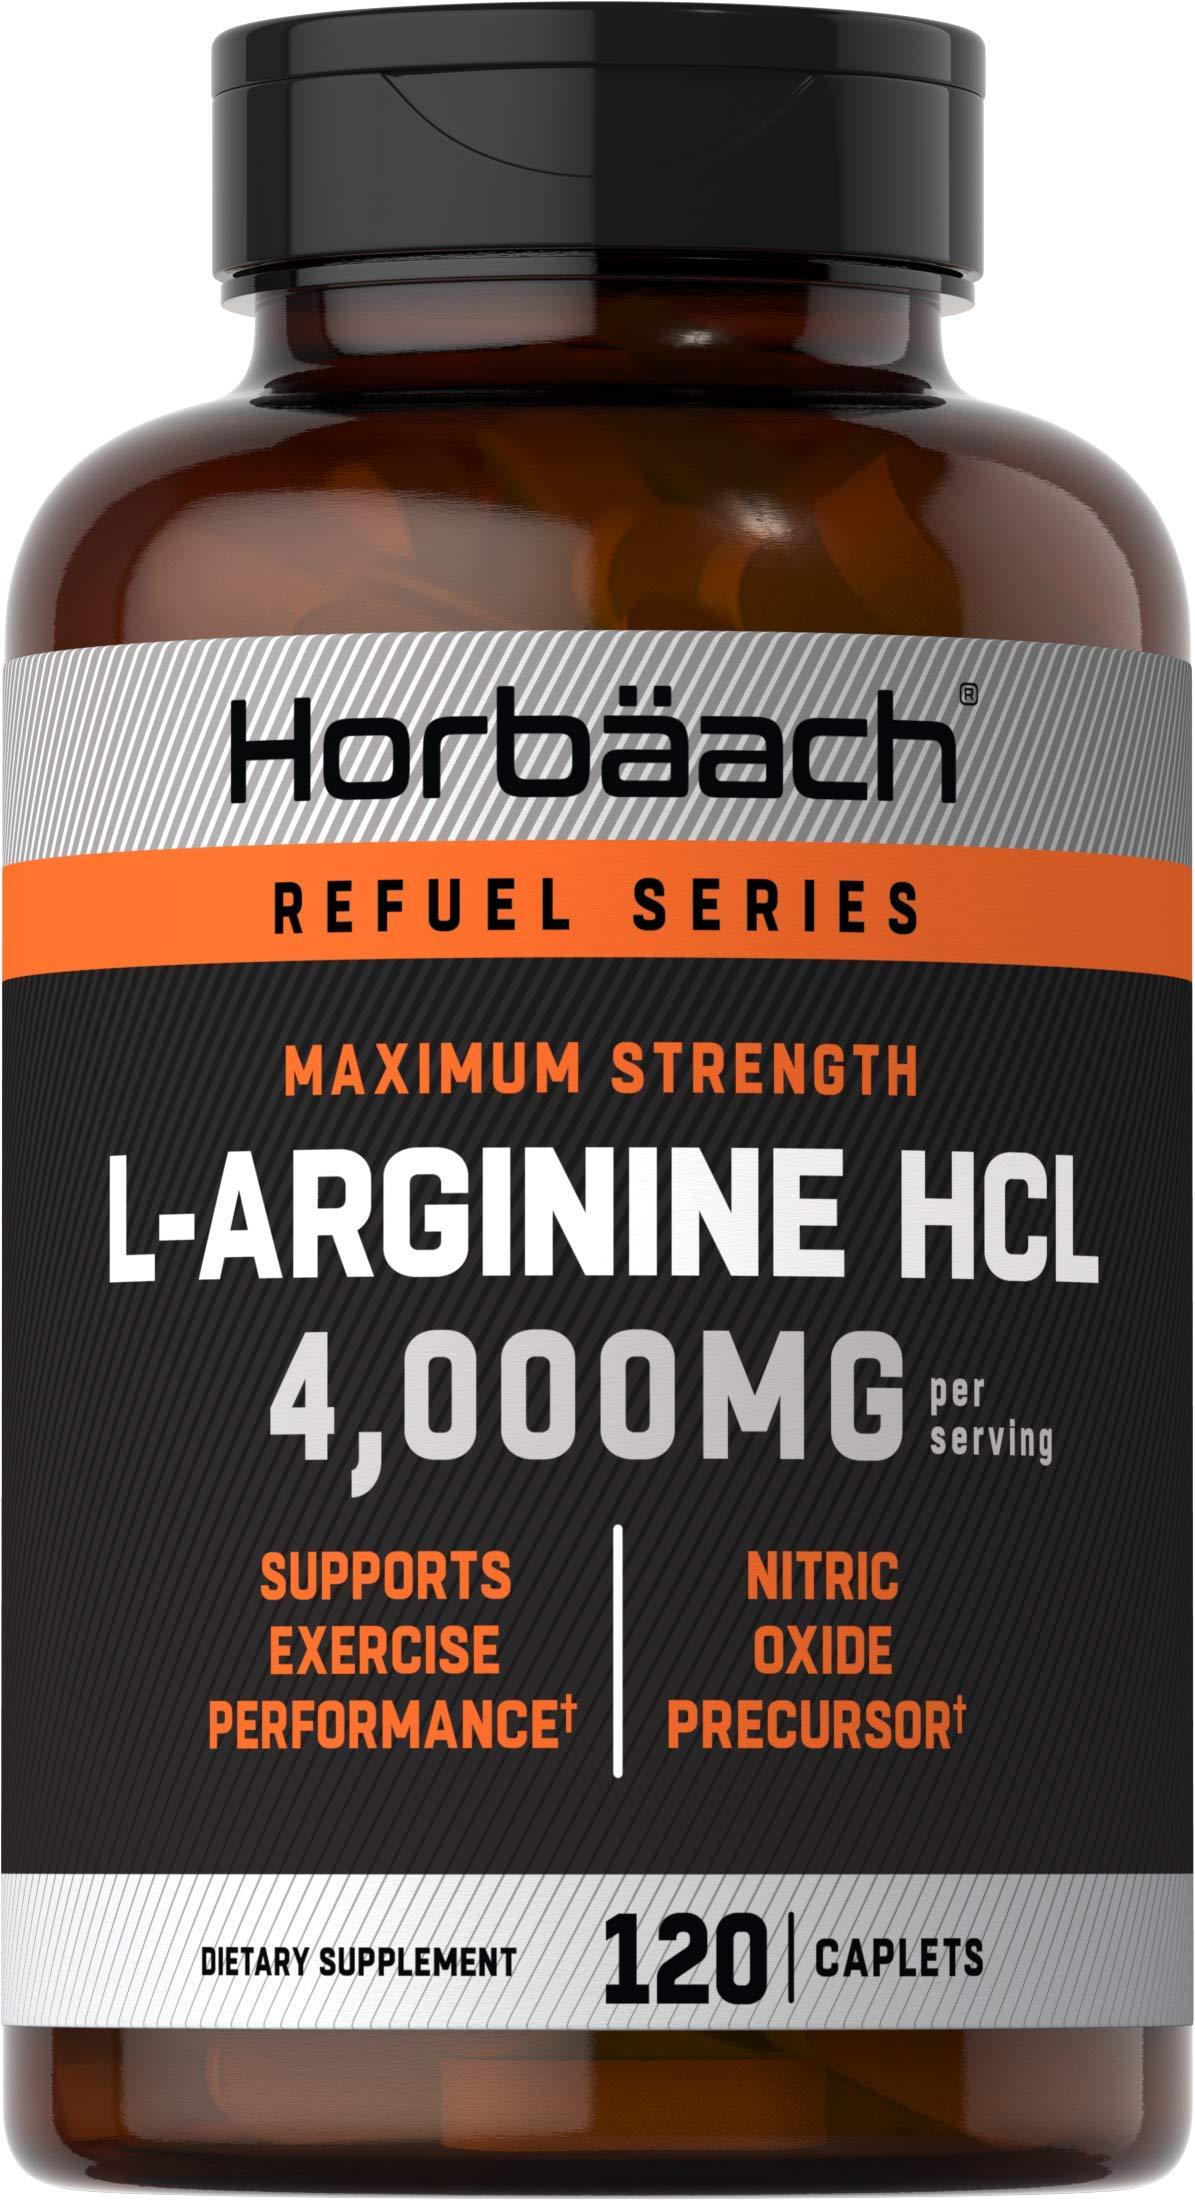 L Arginine 4000 mg | 120 Caplets | Maximum Strength Nitric Oxide Precursor | Vegetarian, Non-GMO, Gluten Free | L-Arginine Supplement | by Horbaach